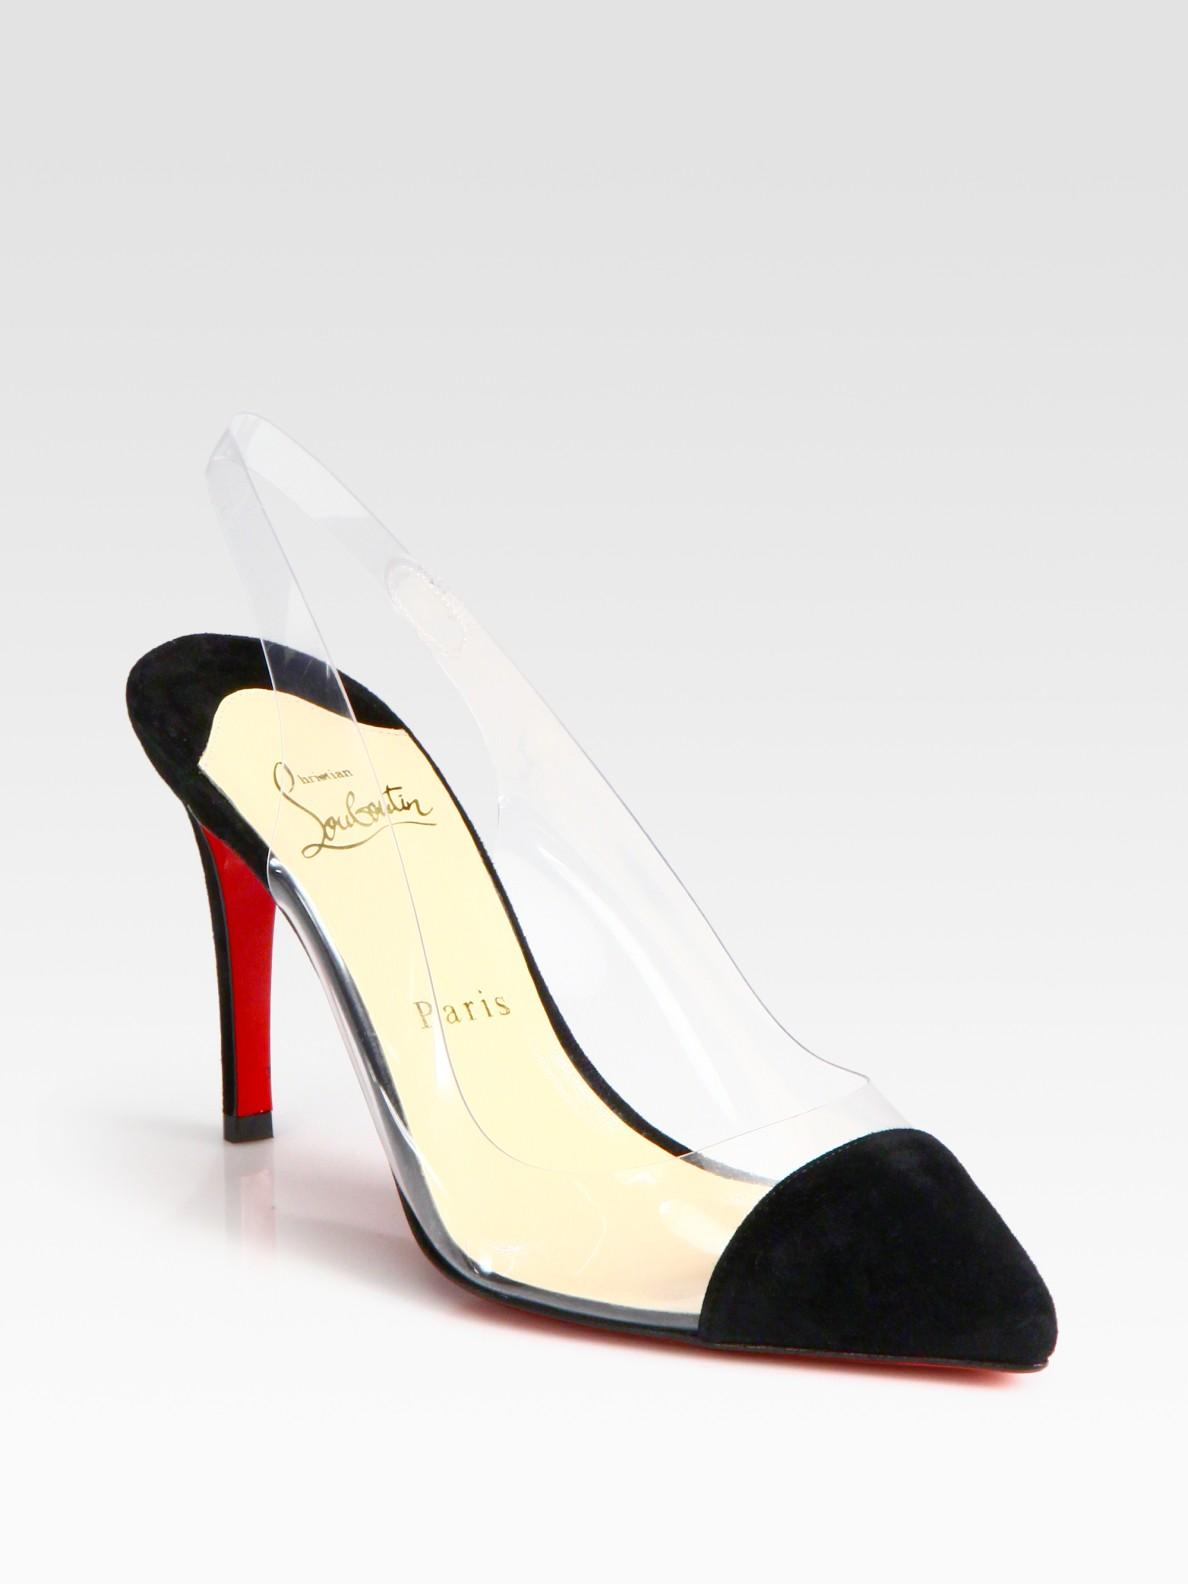 imitation christian louboutin shoes - Artesur ? christian louboutin satin pointed-toe slingback pumps Black